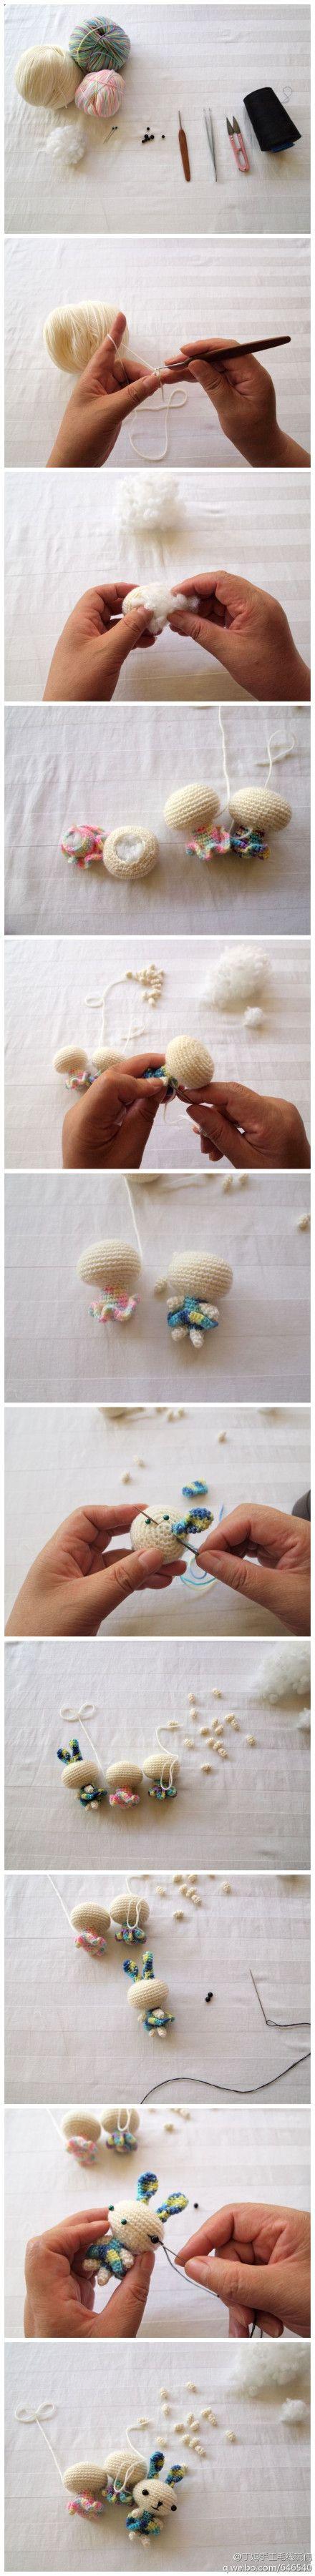 how to make a bunny amigurumi Animals Pinterest Toys ...